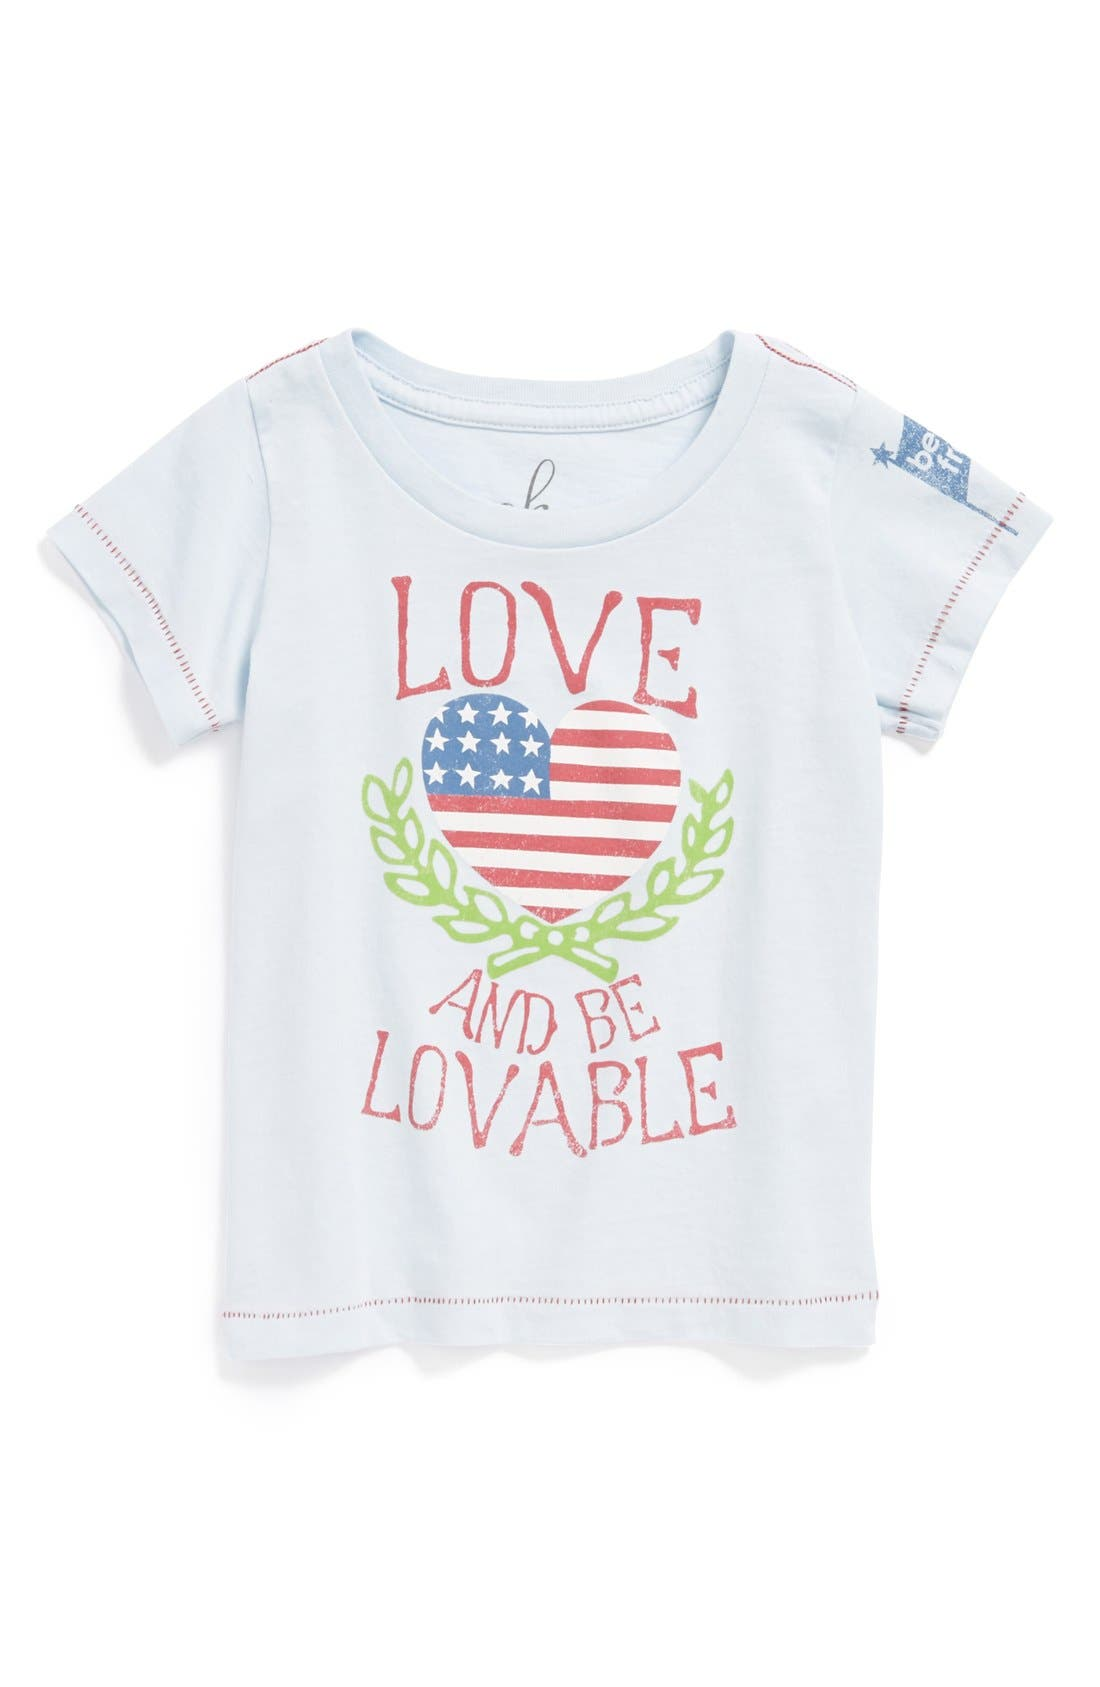 Main Image - Peek 'Love & Be Loveable' Tee (Baby Girls)